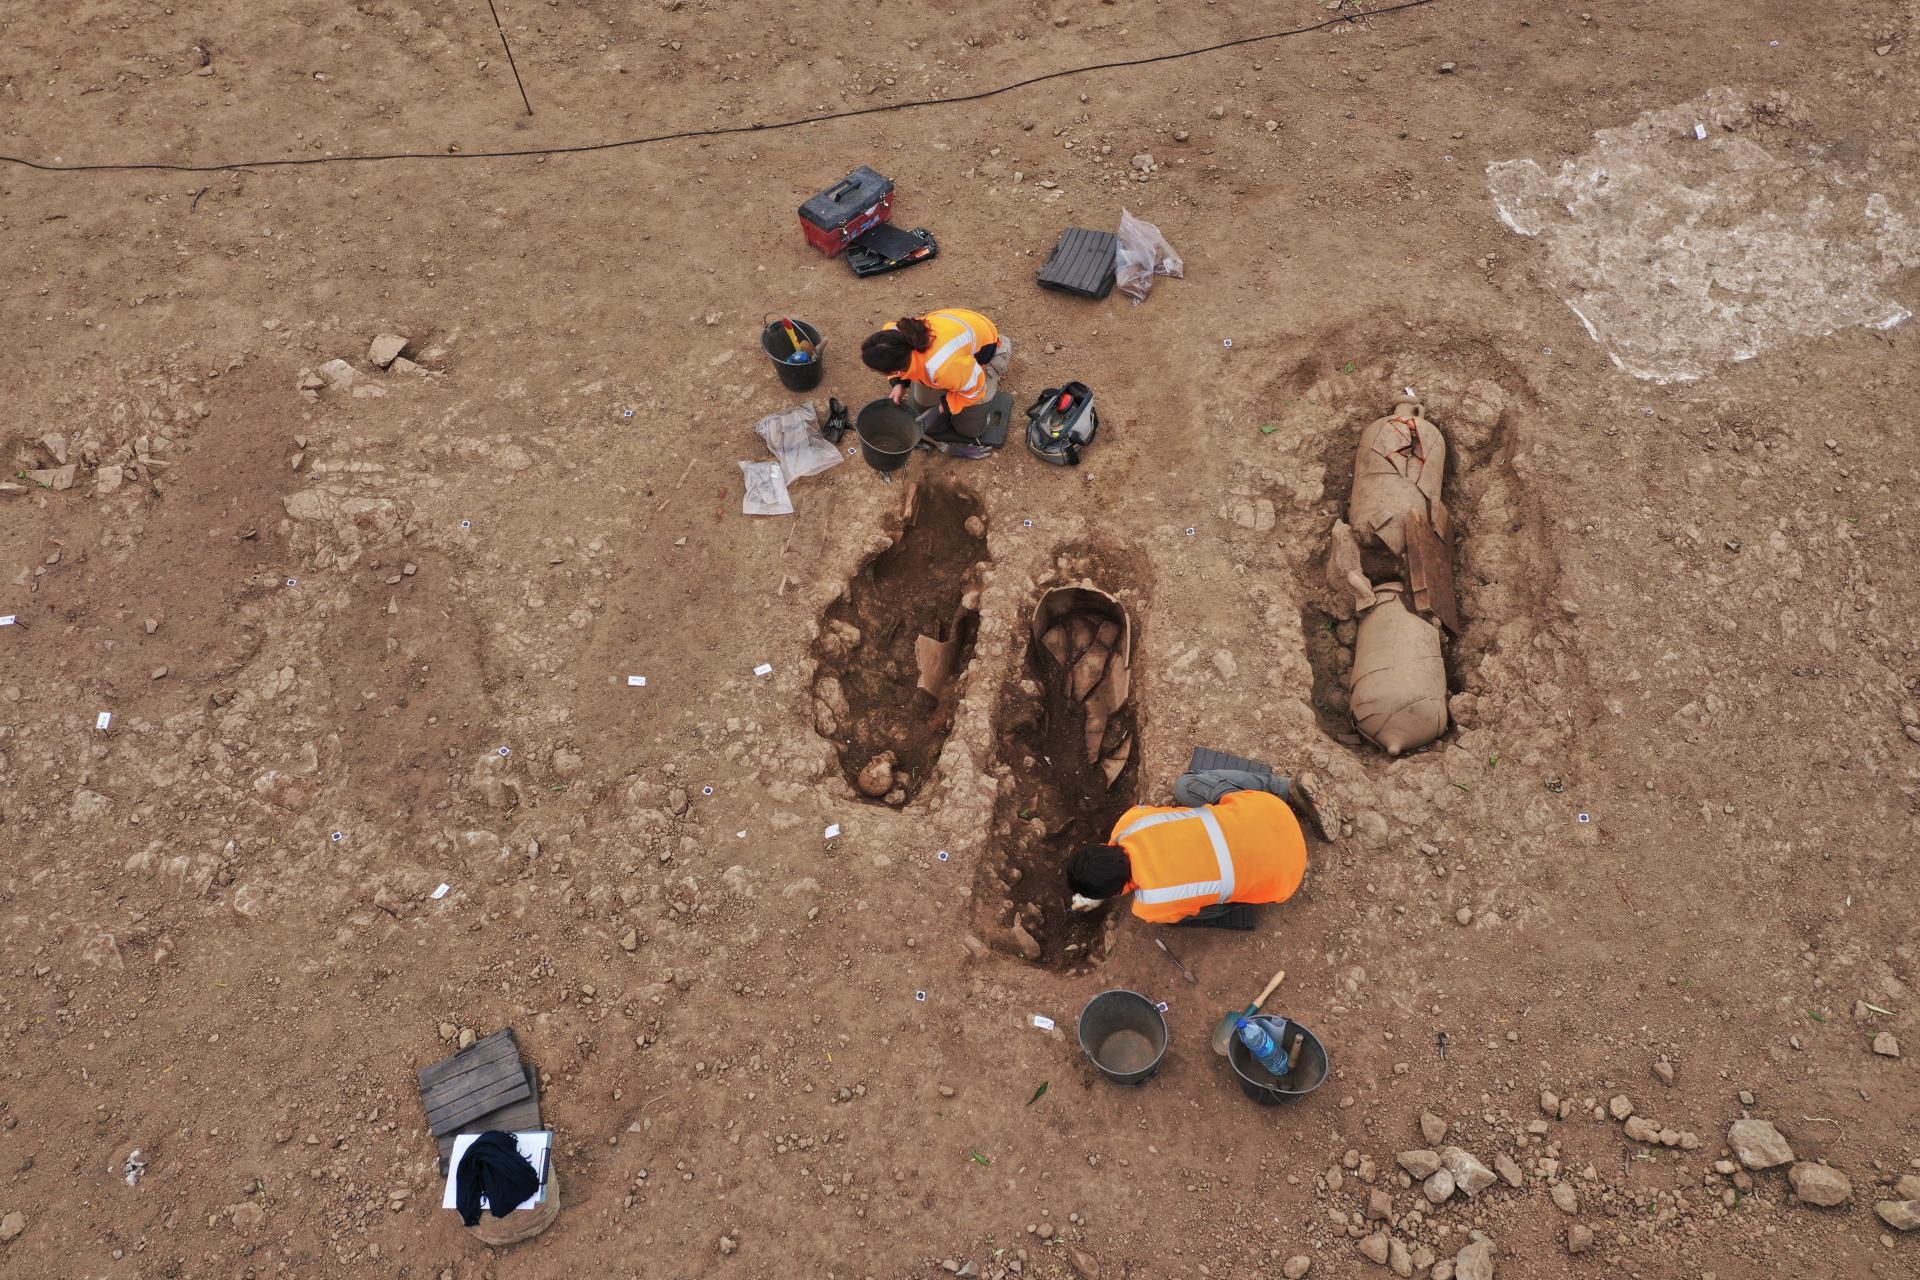 Late Imperial necropolis found in Corsica